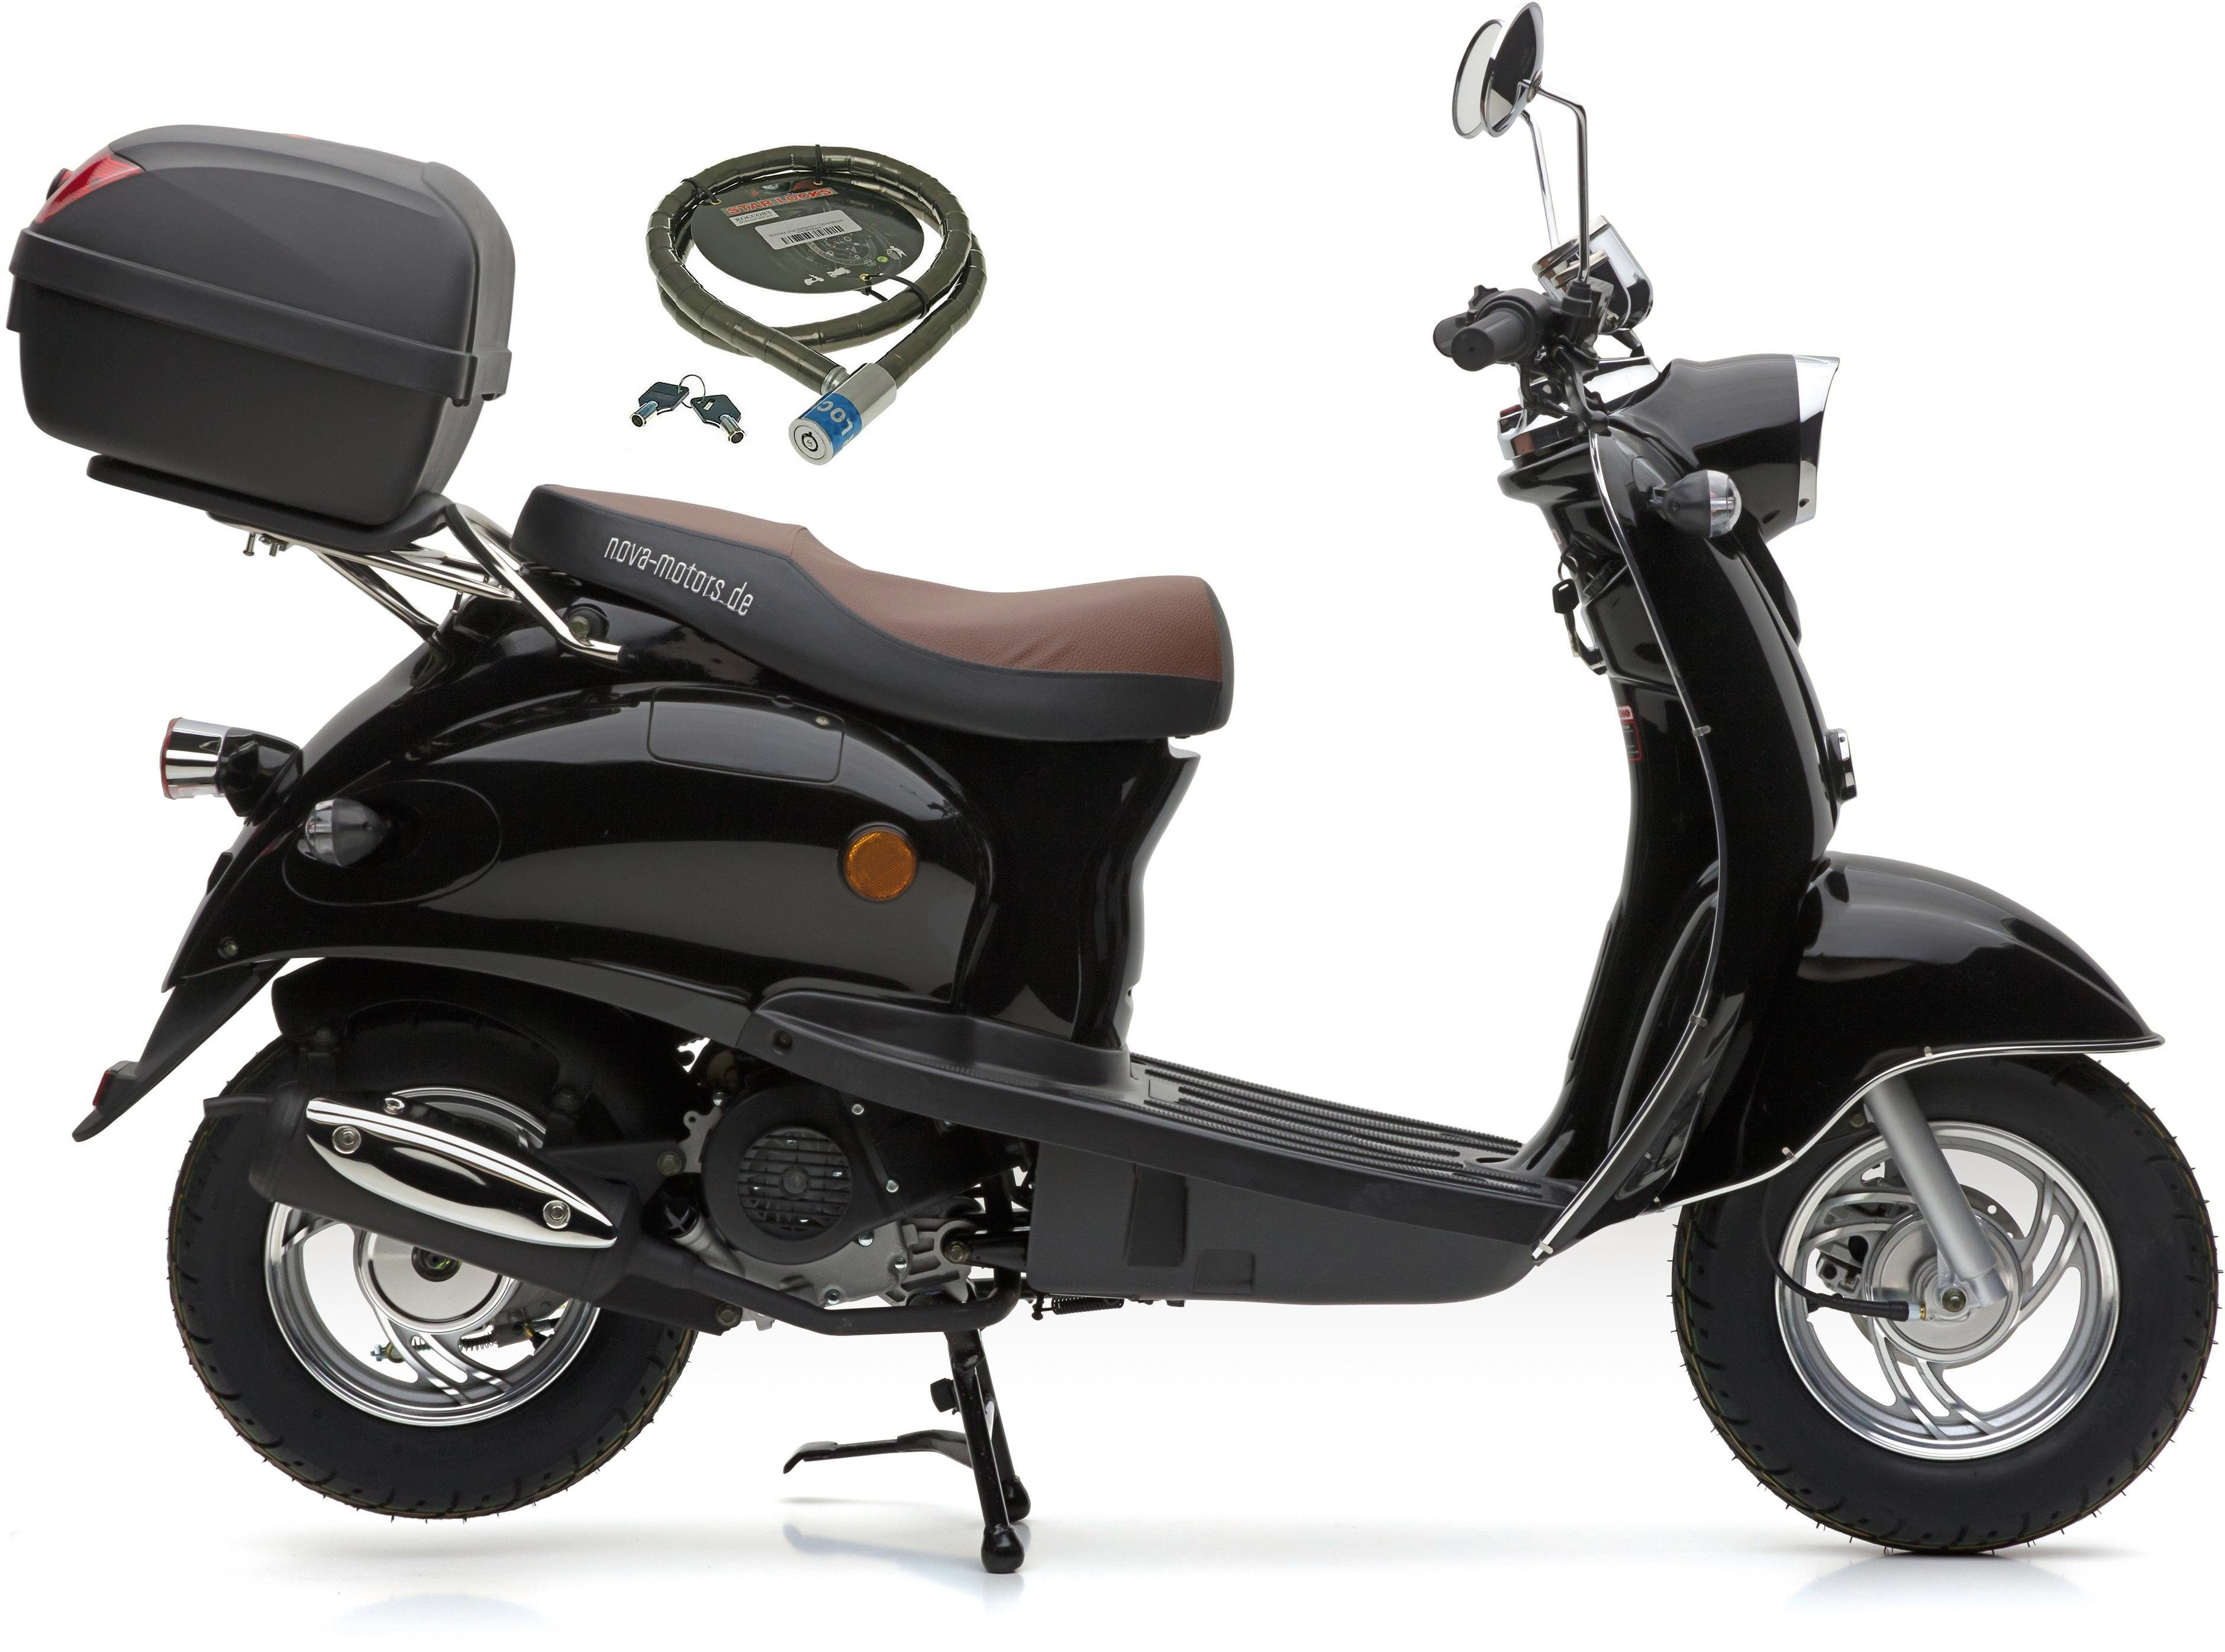 Nova Motors Motorroller »Retro Star«, 49 ccm, 45 km/h, Euro 4, (Set, mit Topcase), inkl. Topcase, 49 ccm, 45 km/h